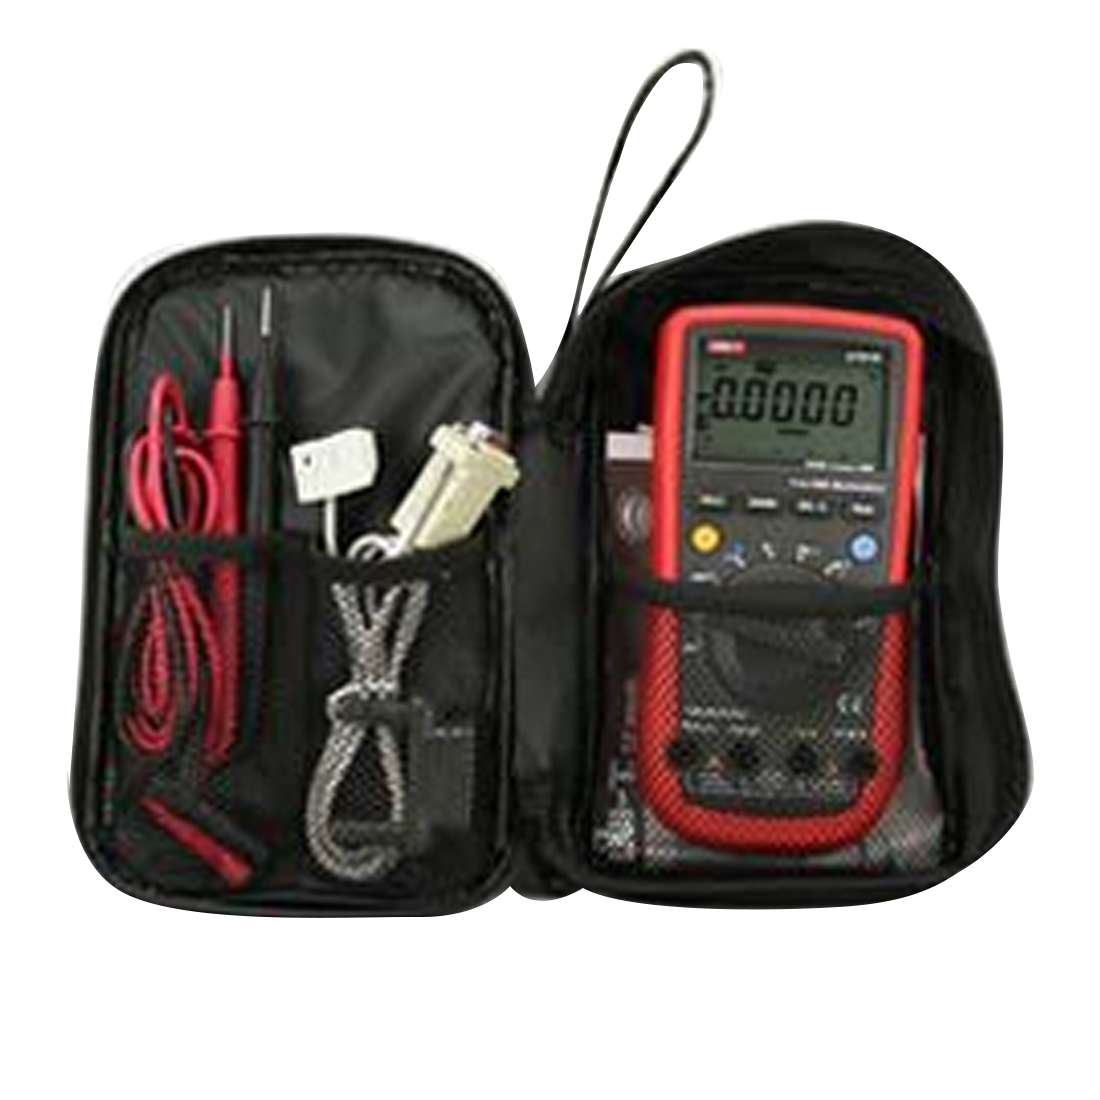 durable-multimeter-waterproof-tools-bag-black-canvas-bag-for-ut61-series-digital-multimeter-cloth-20-12-4cm